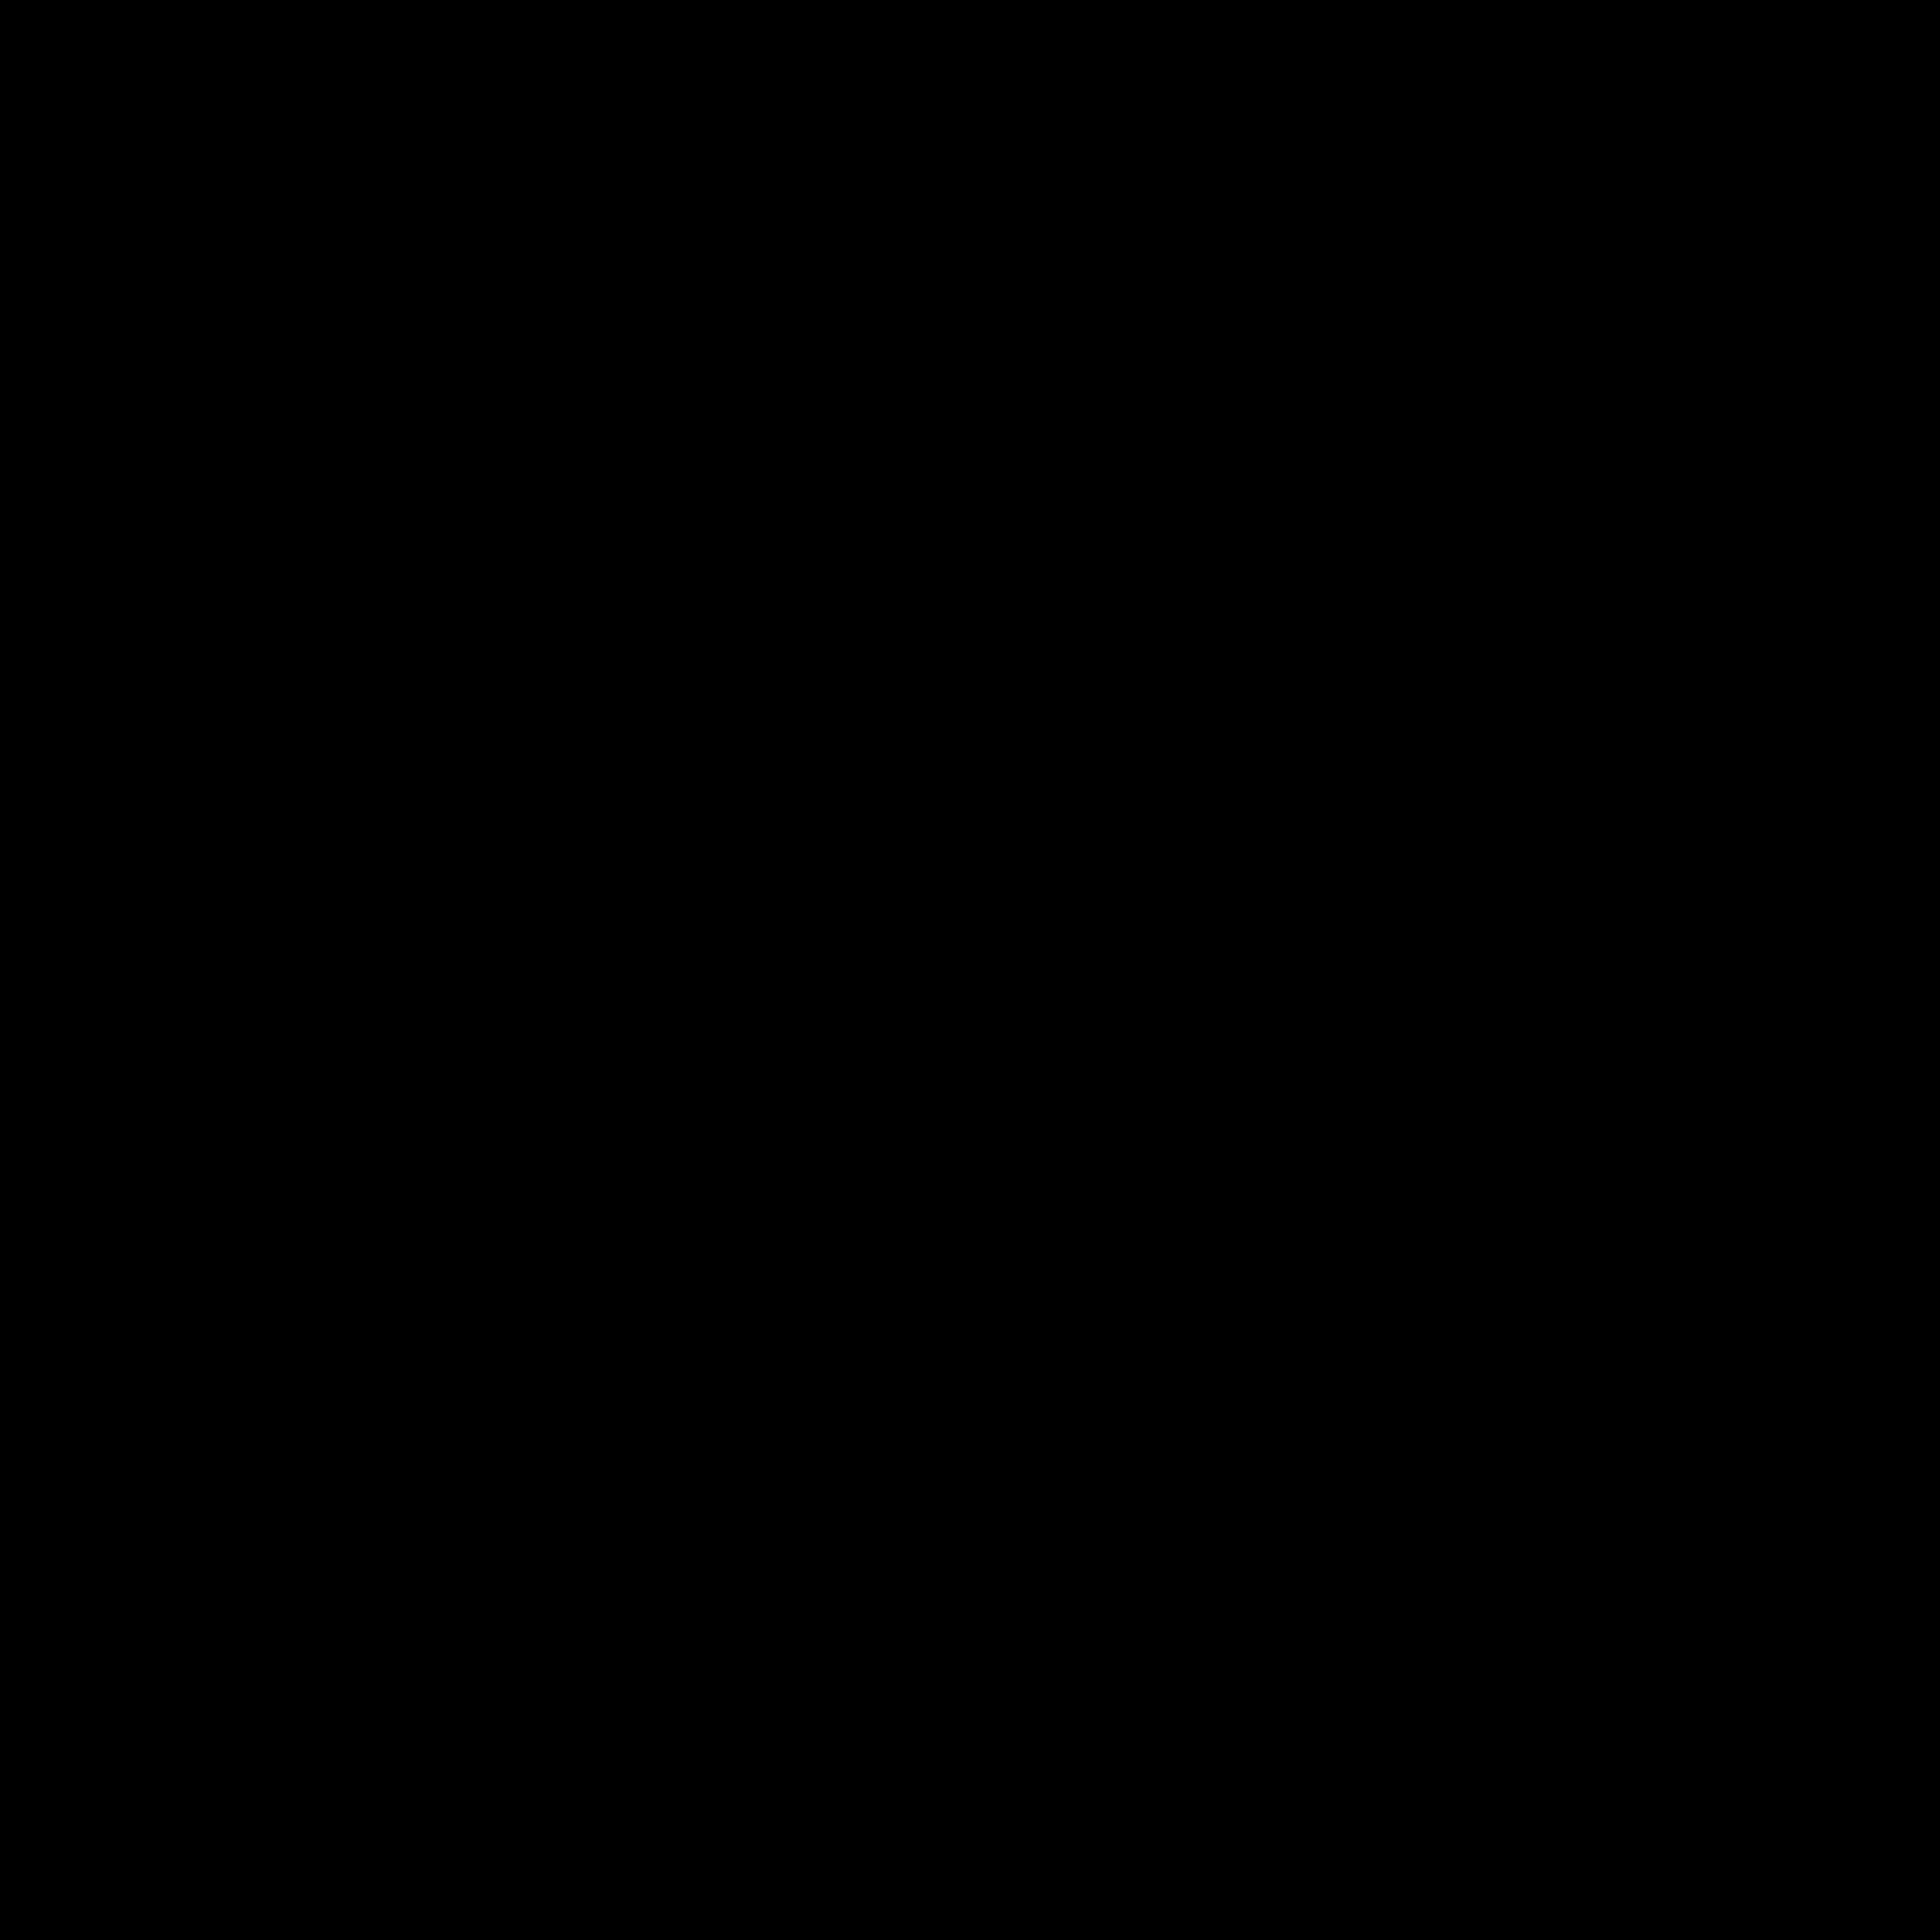 black-netflix-logo-png-4.png